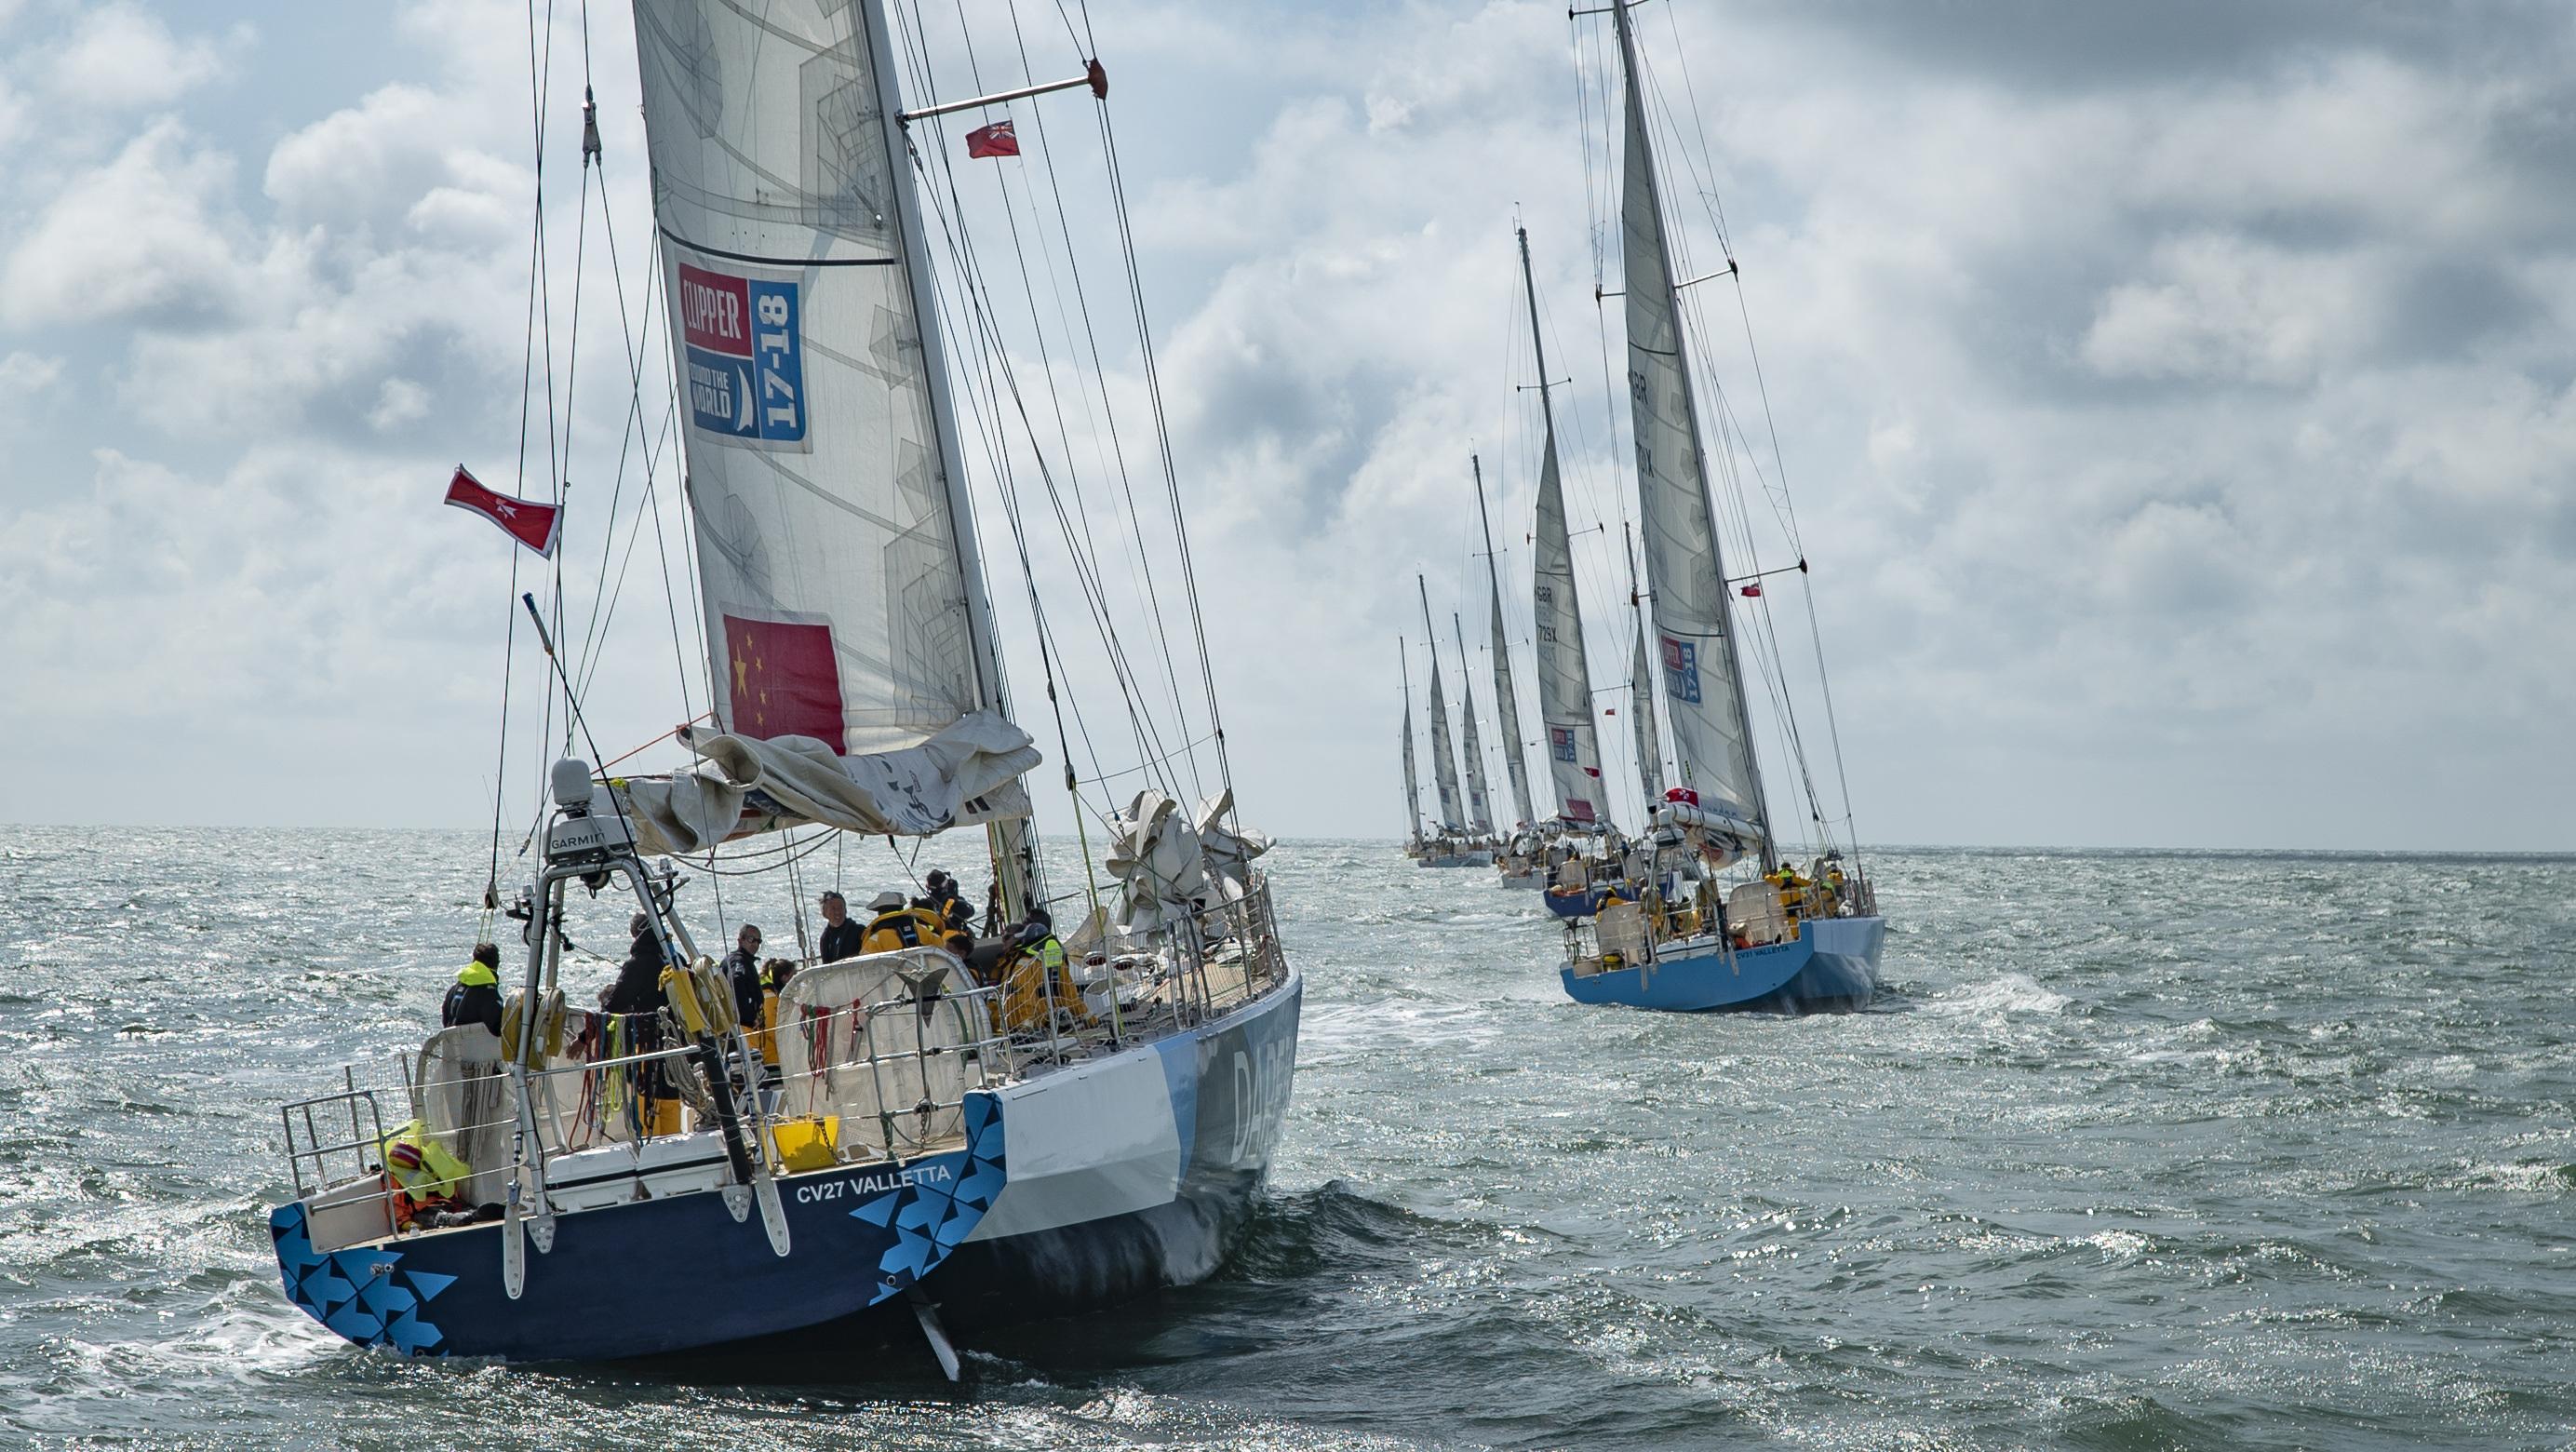 Clipper Yacht Race boats on the ocean